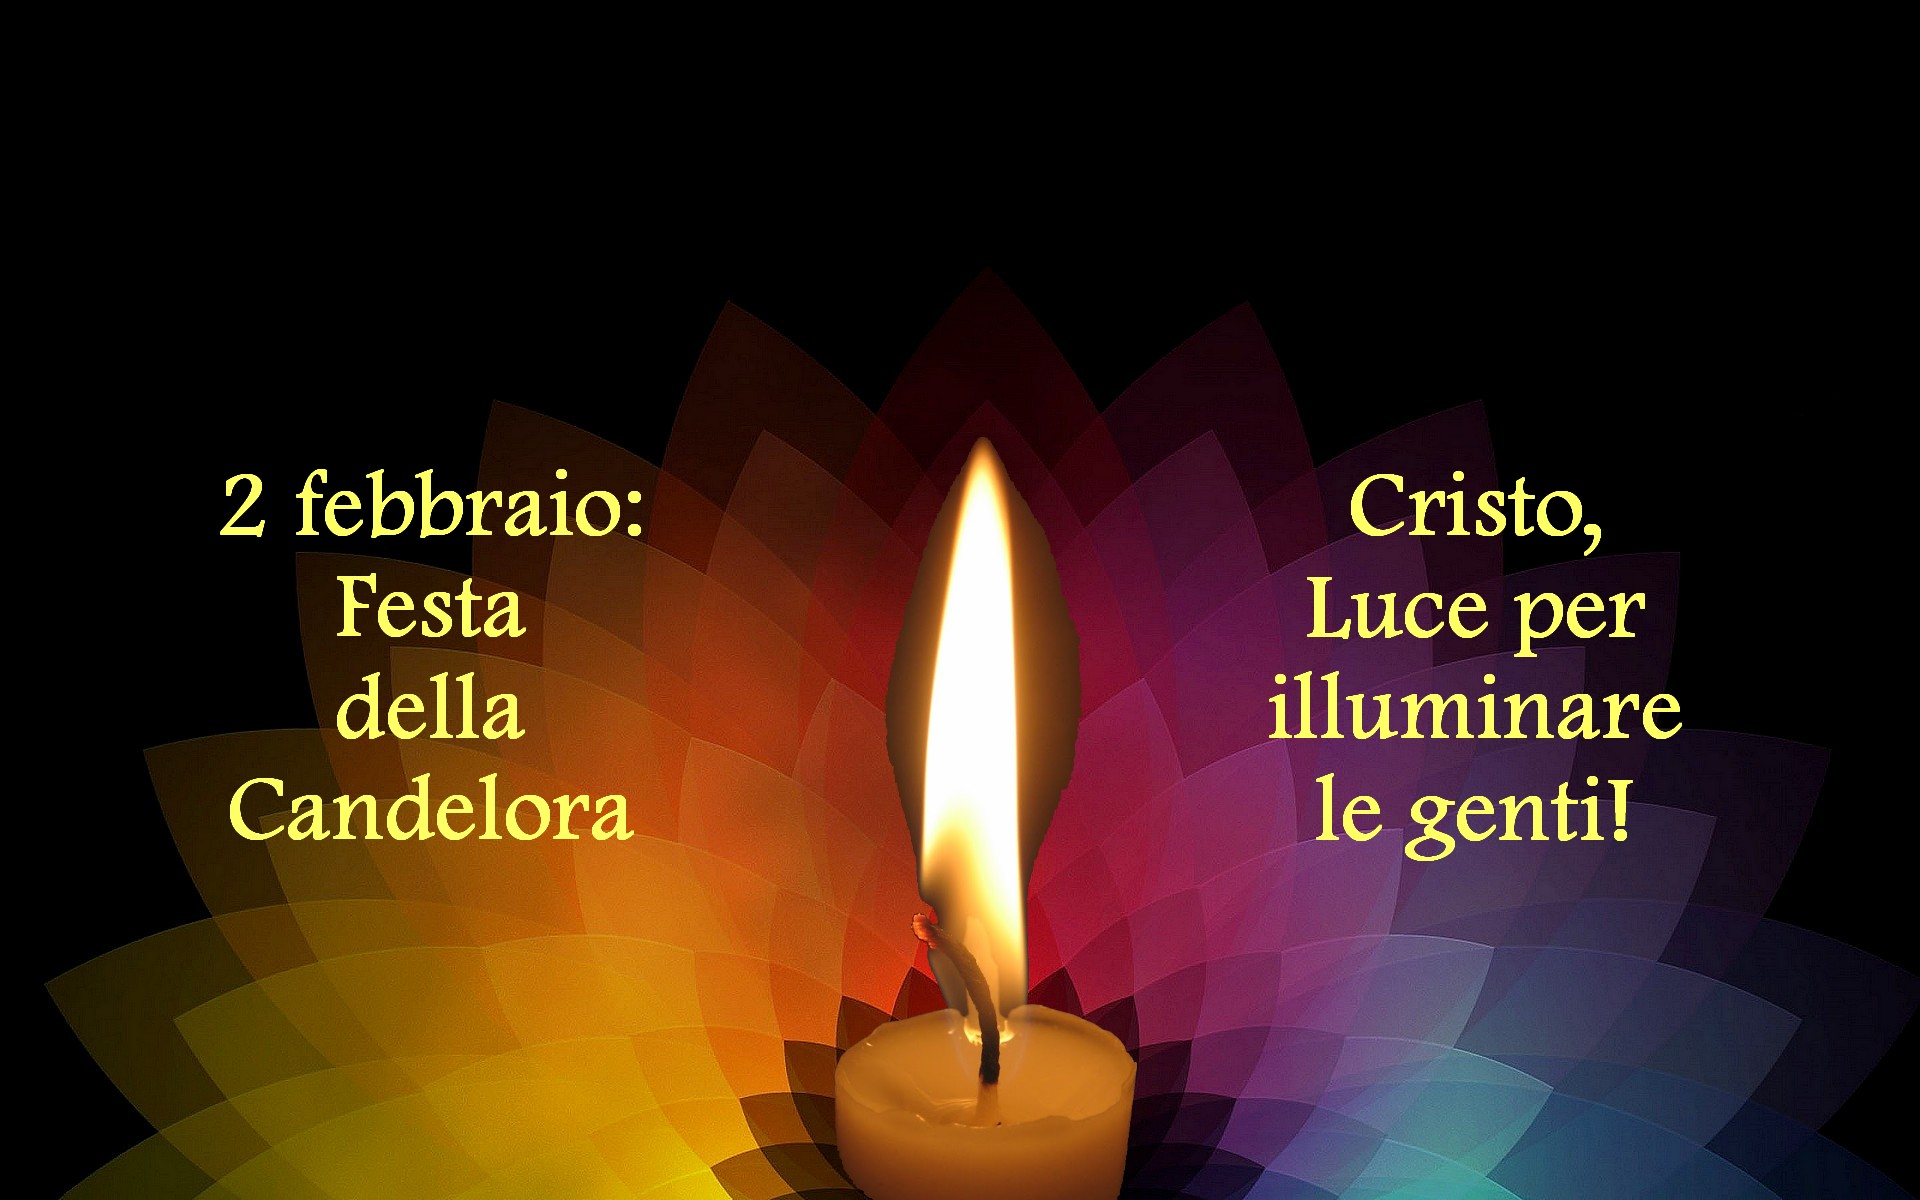 http://www.parrocchiacasperia.org/wp-content/uploads/2017/01/NCLyJfN.jpg